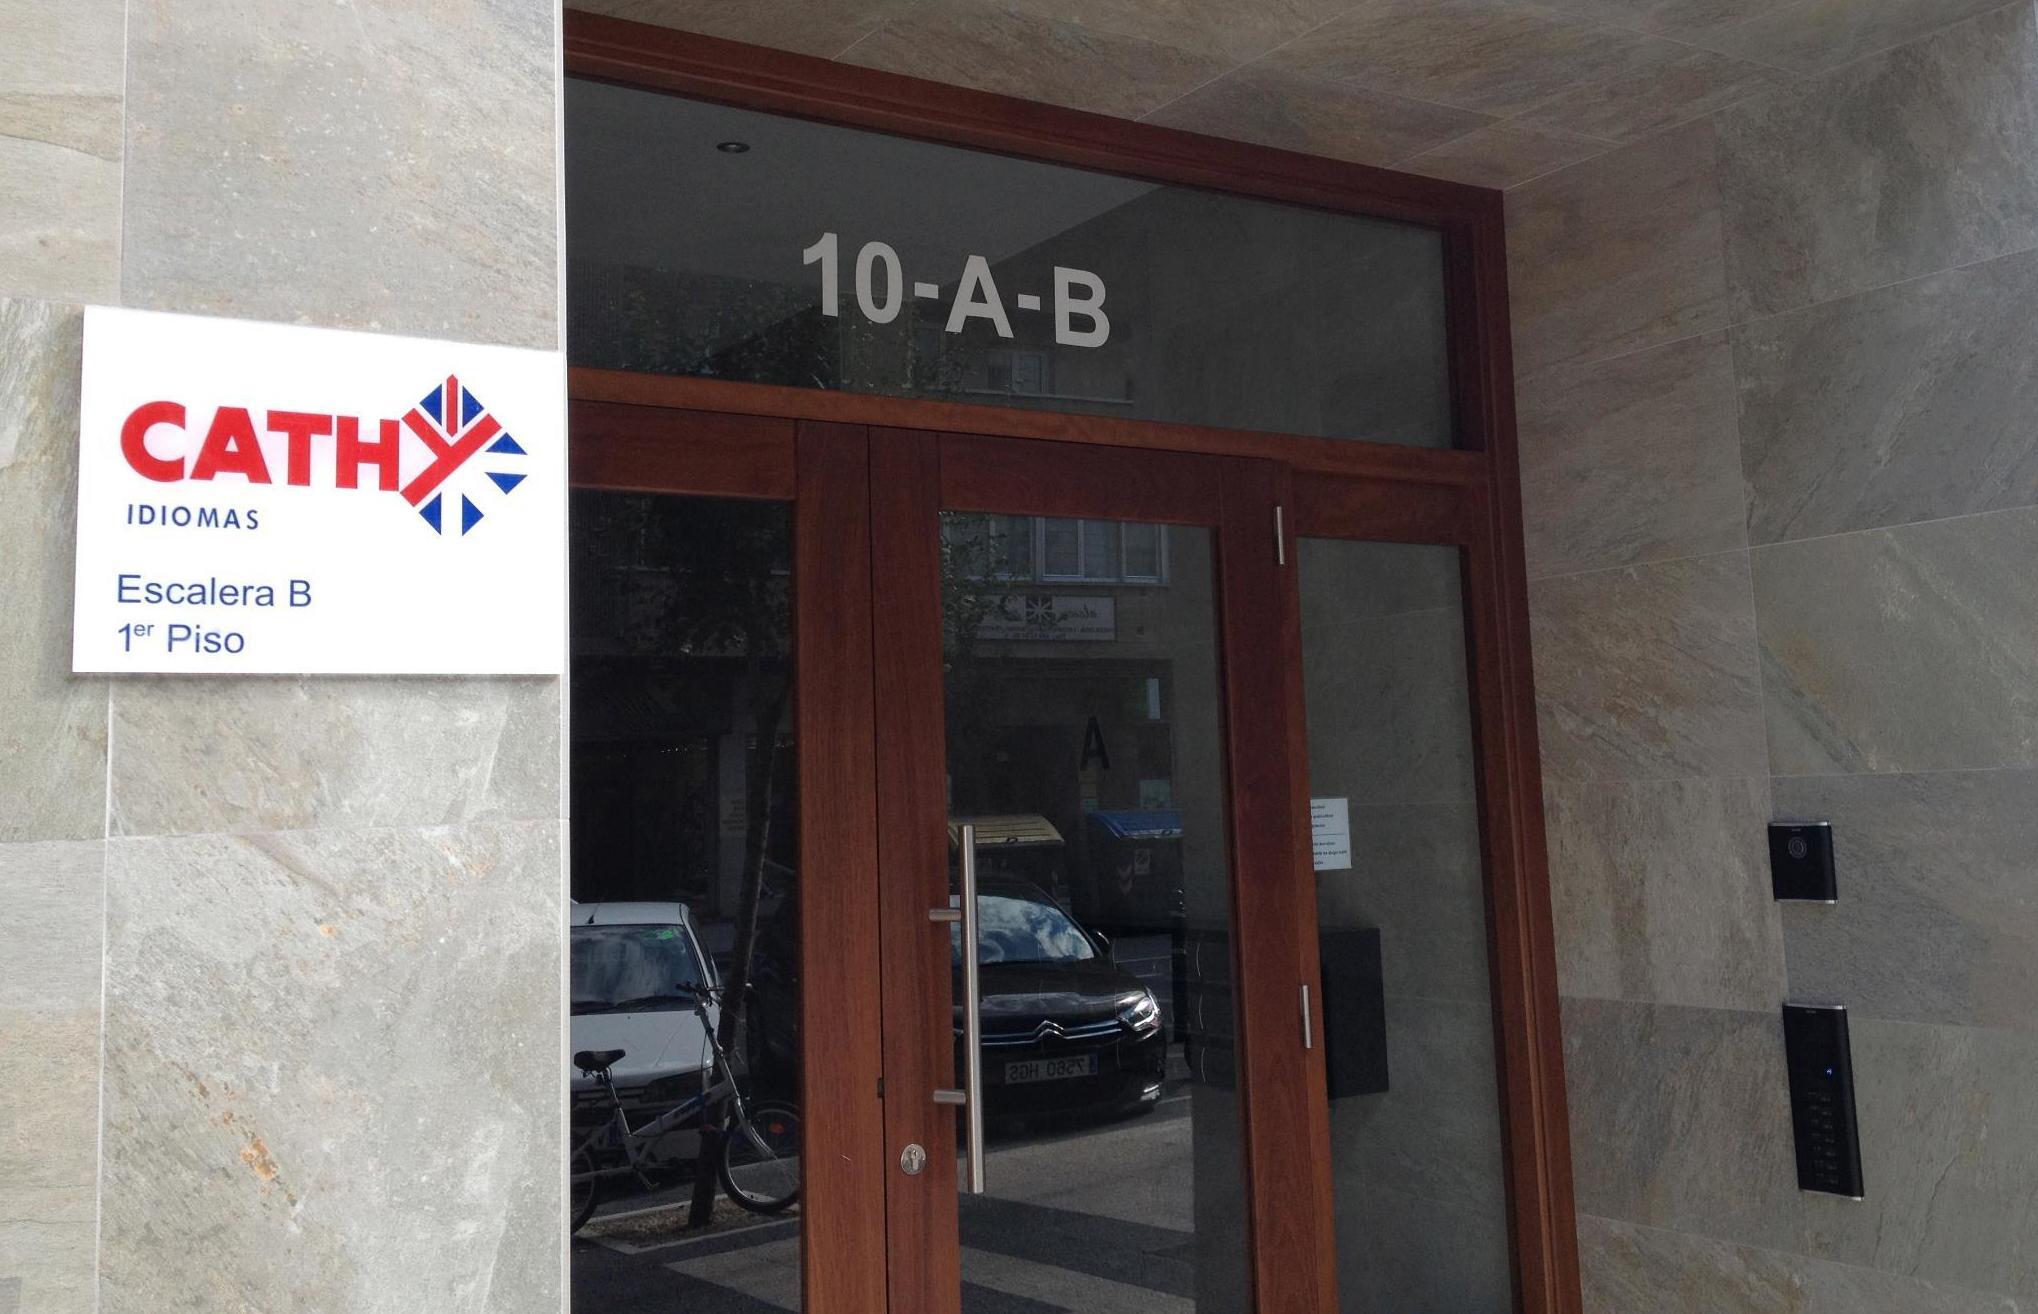 Academia de idiomas en Vitoria, Profesores licenciados en inglés